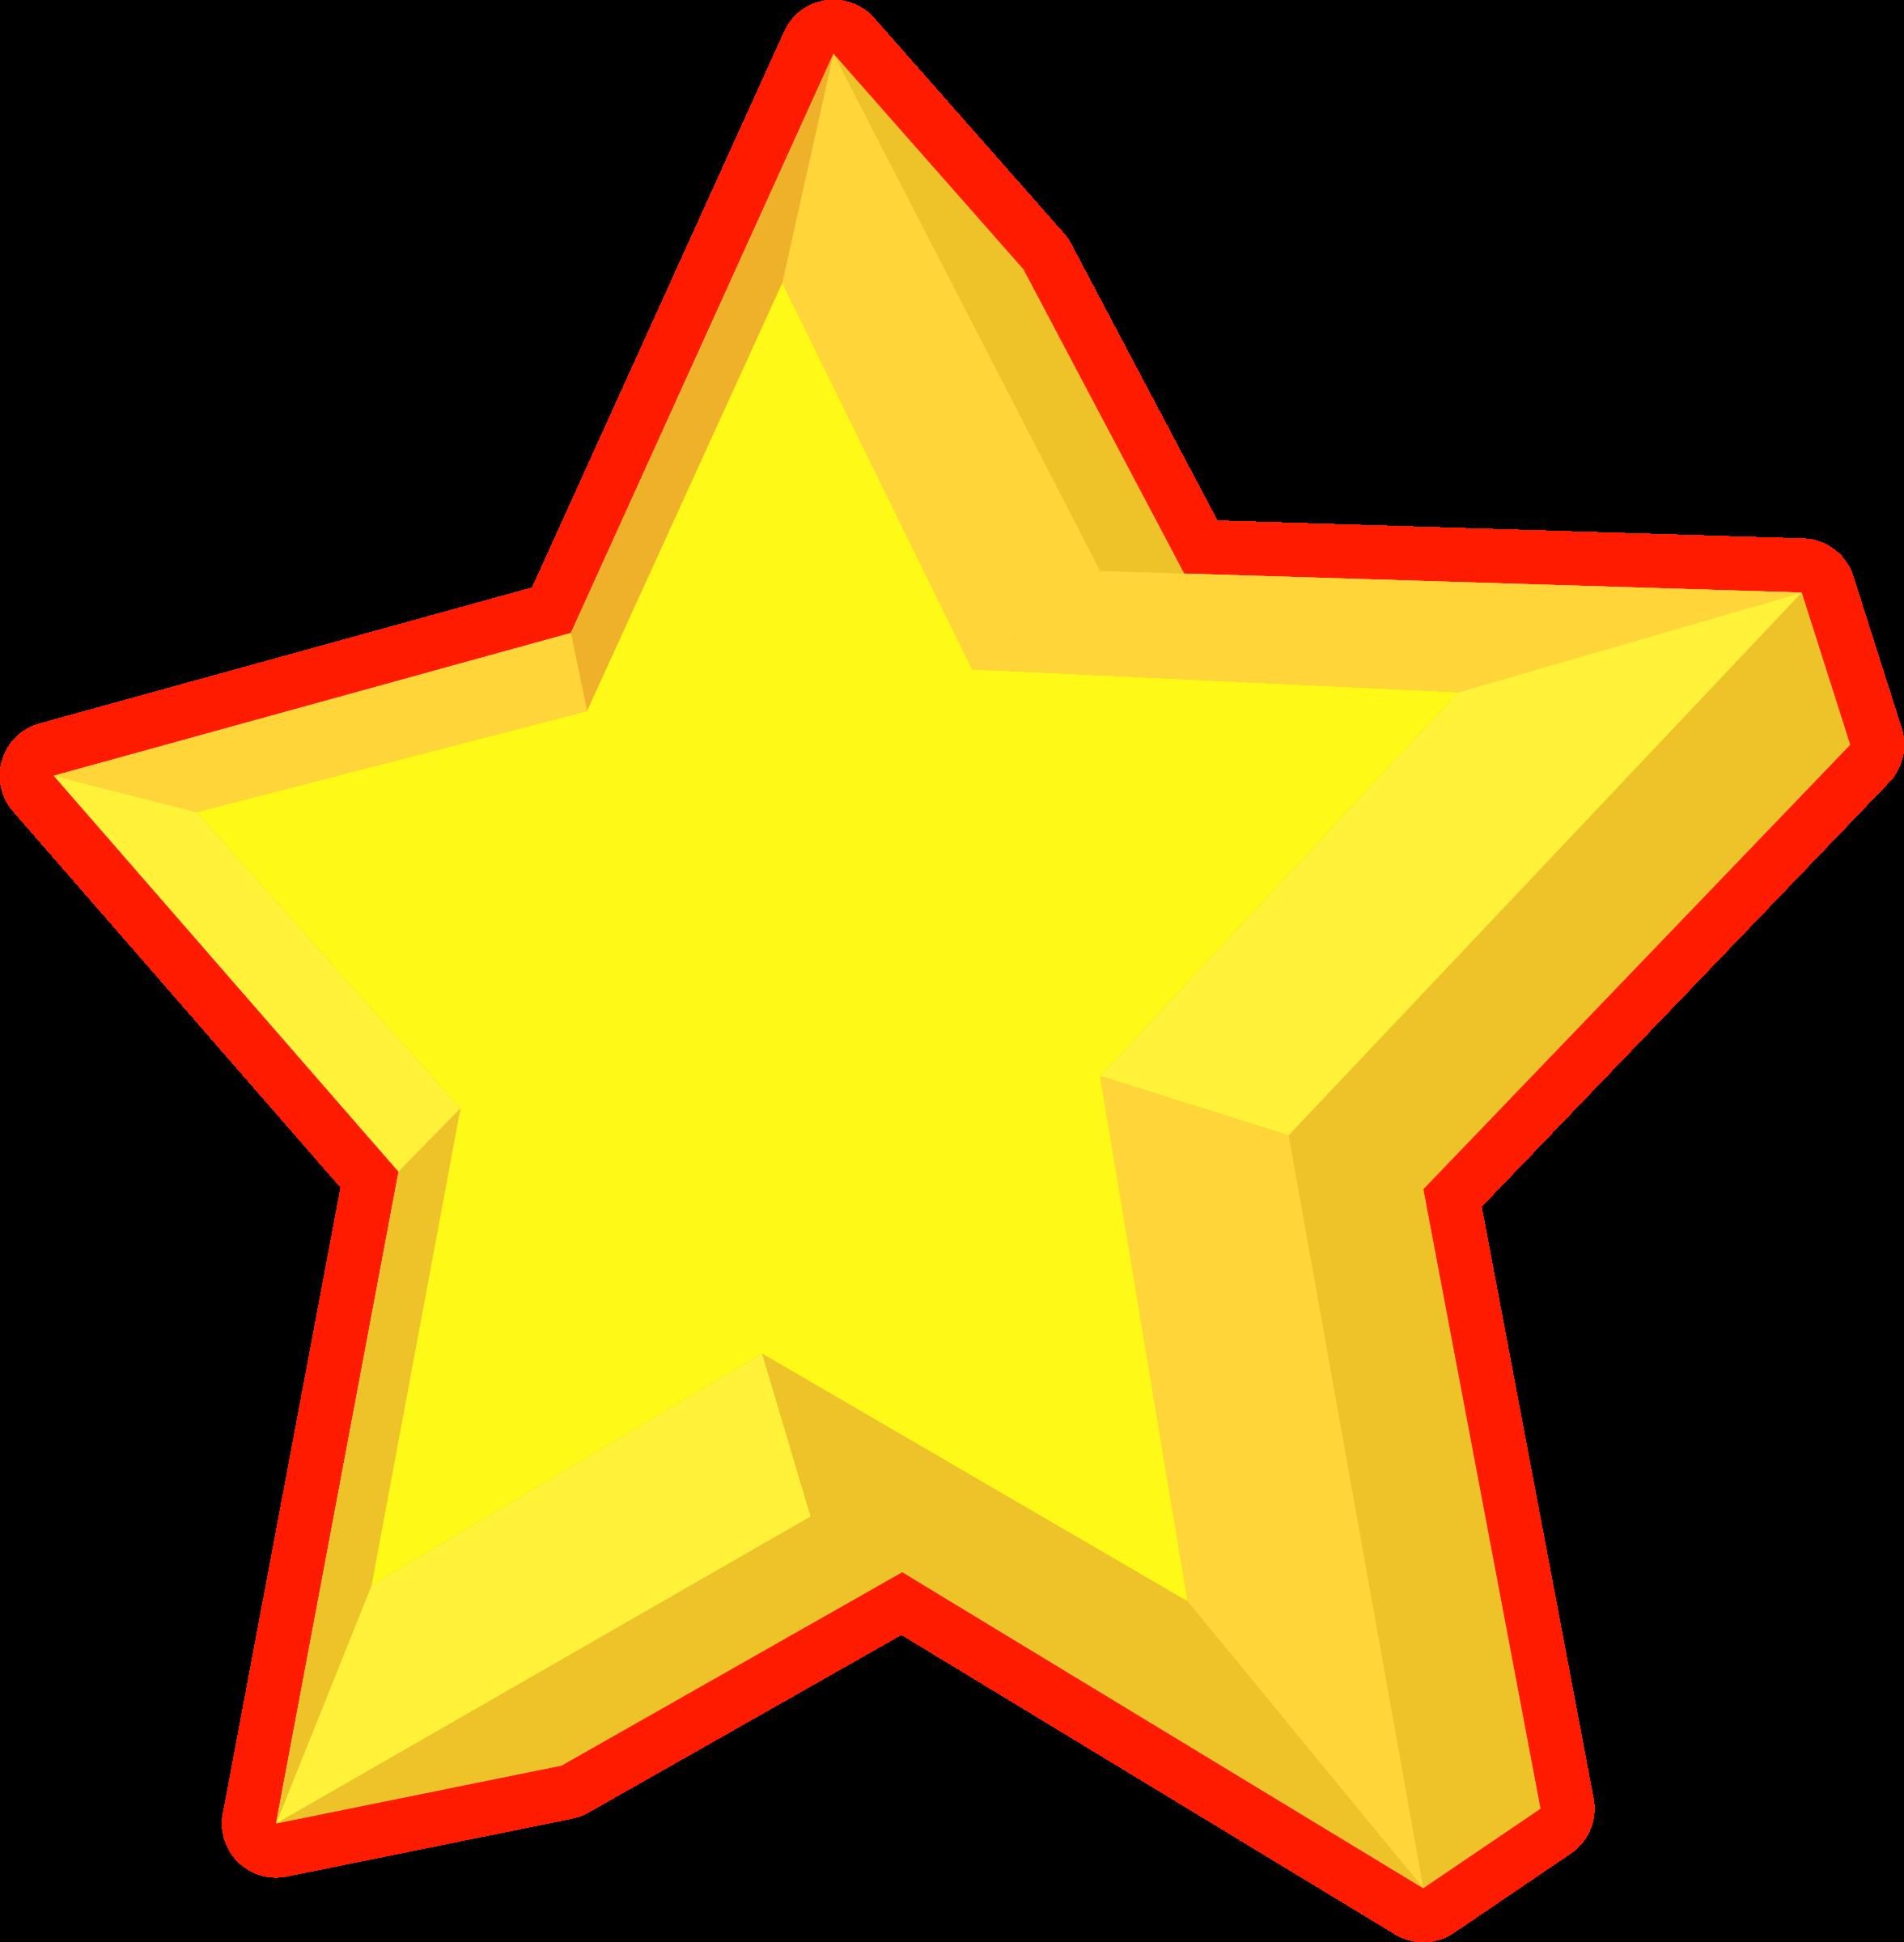 Star reward clipart banner royalty free download Clipart - Simple 3D Star banner royalty free download